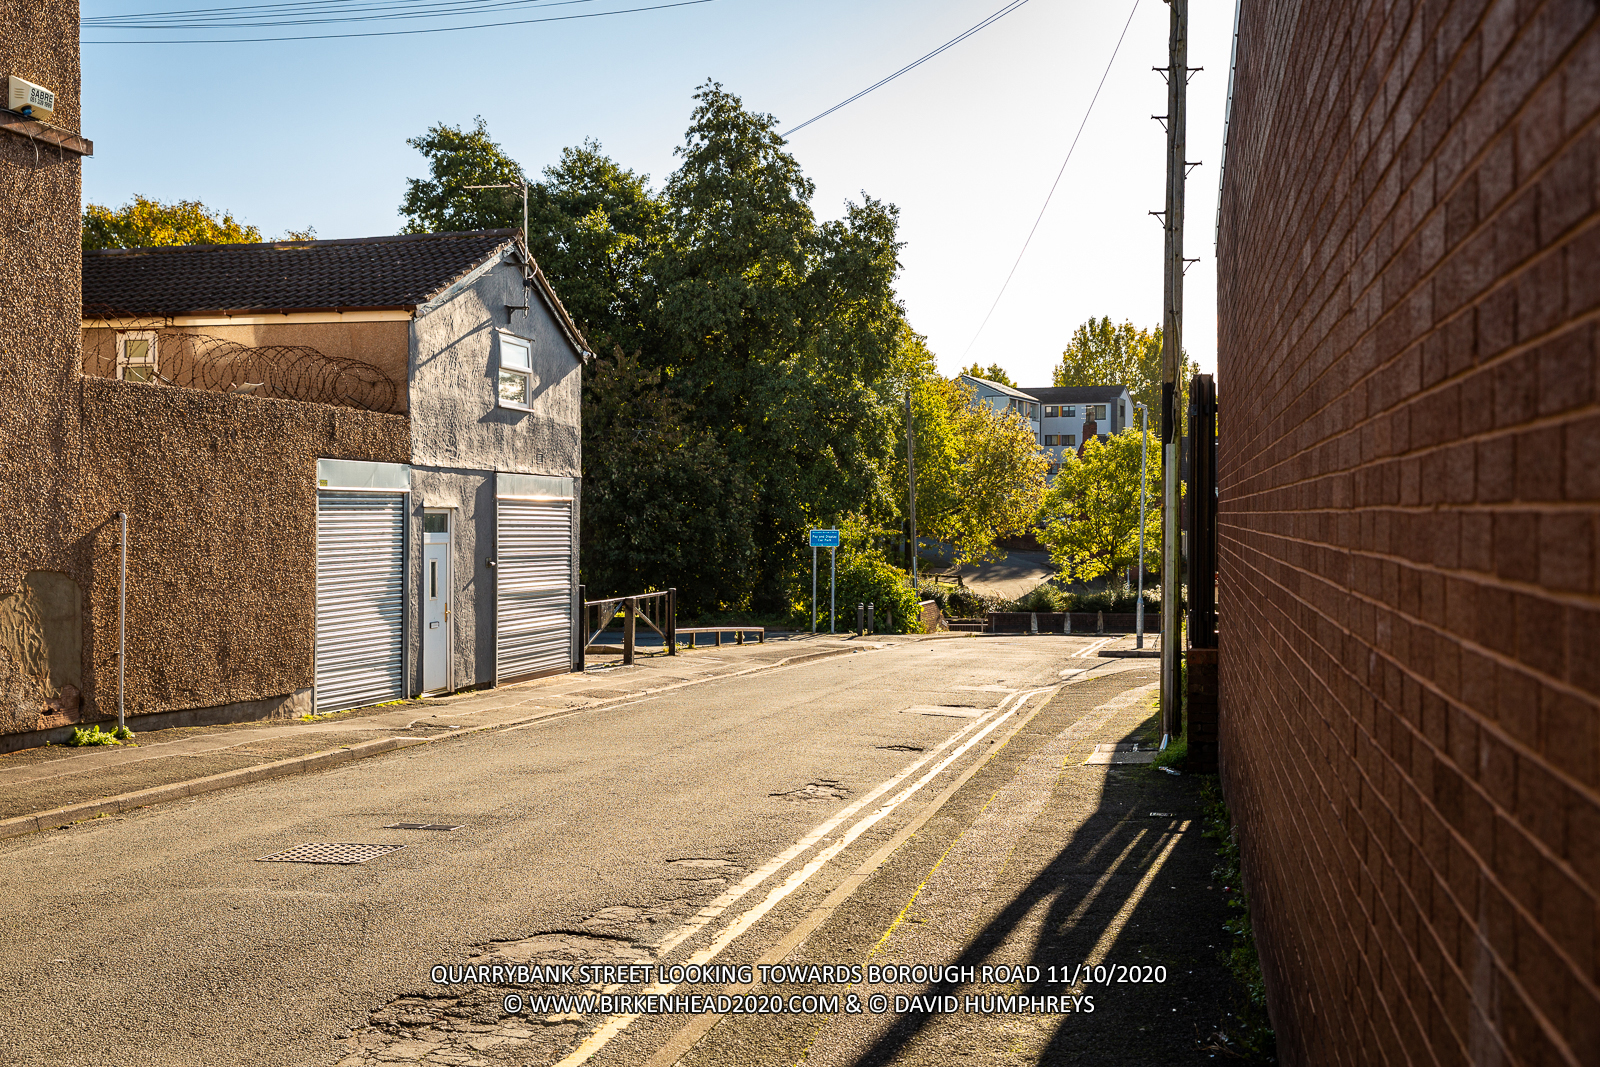 Quarrybank Street